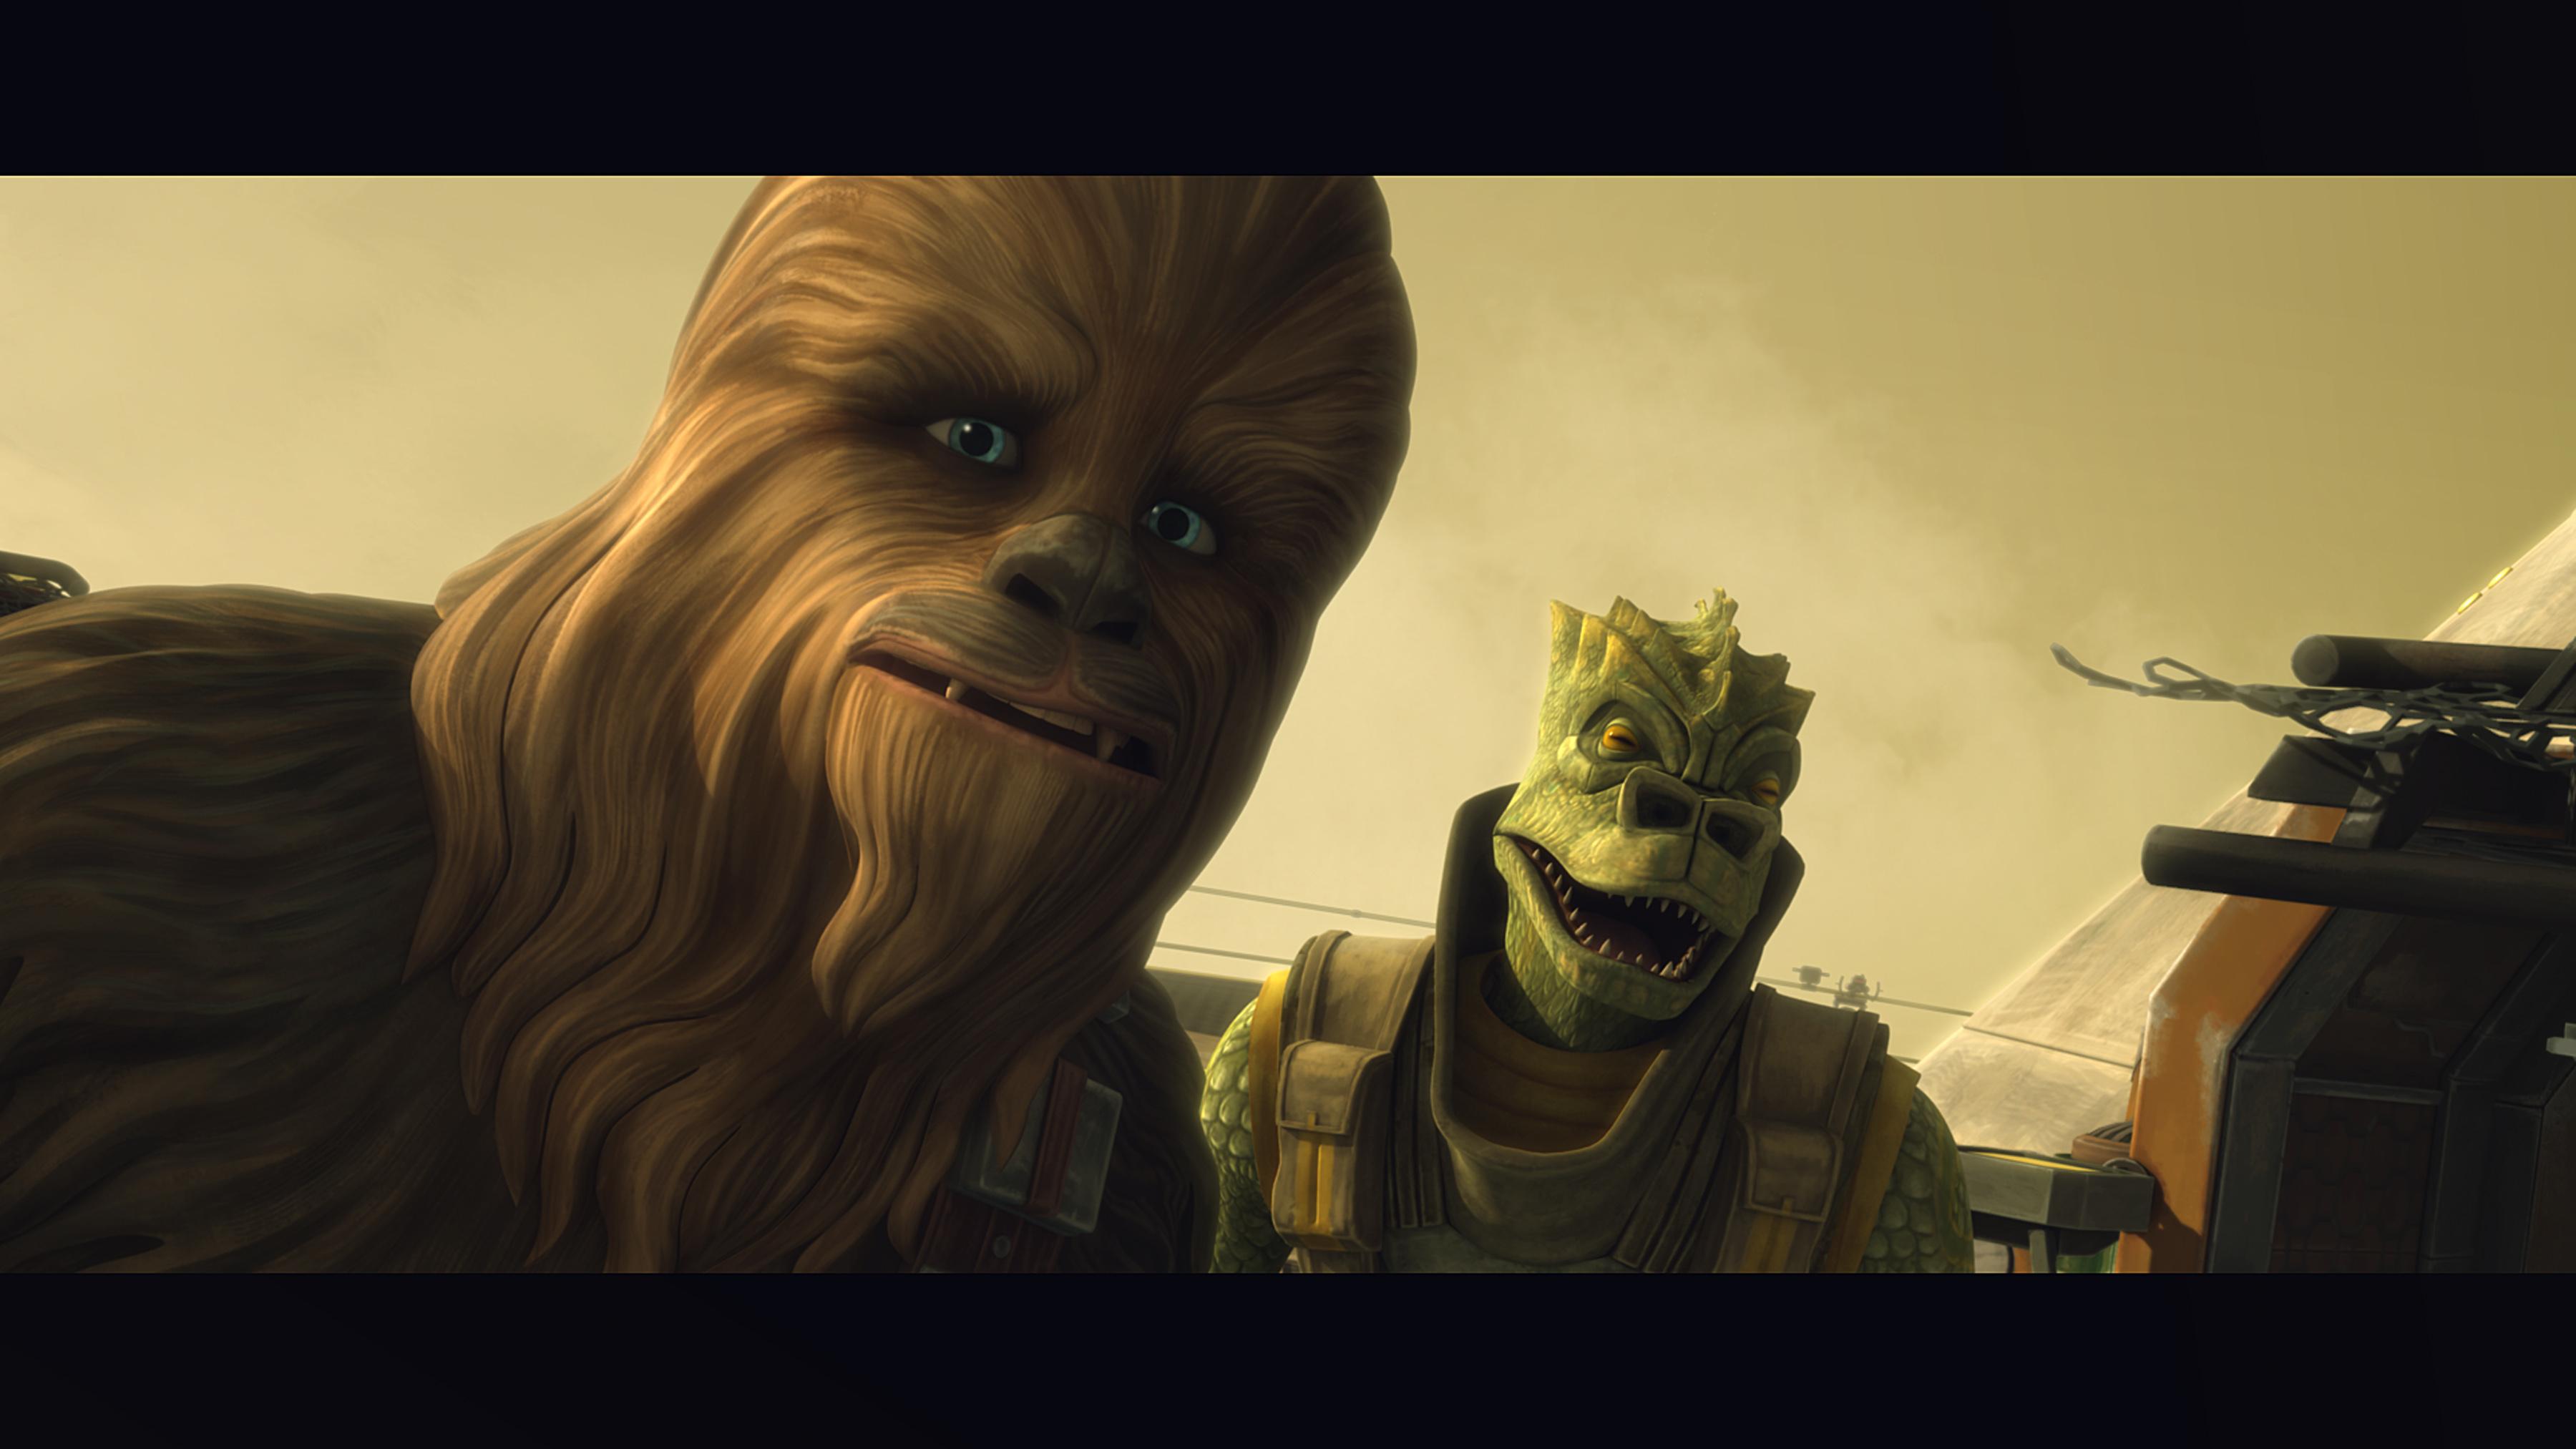 pics photos baby chewbacca wallpaper